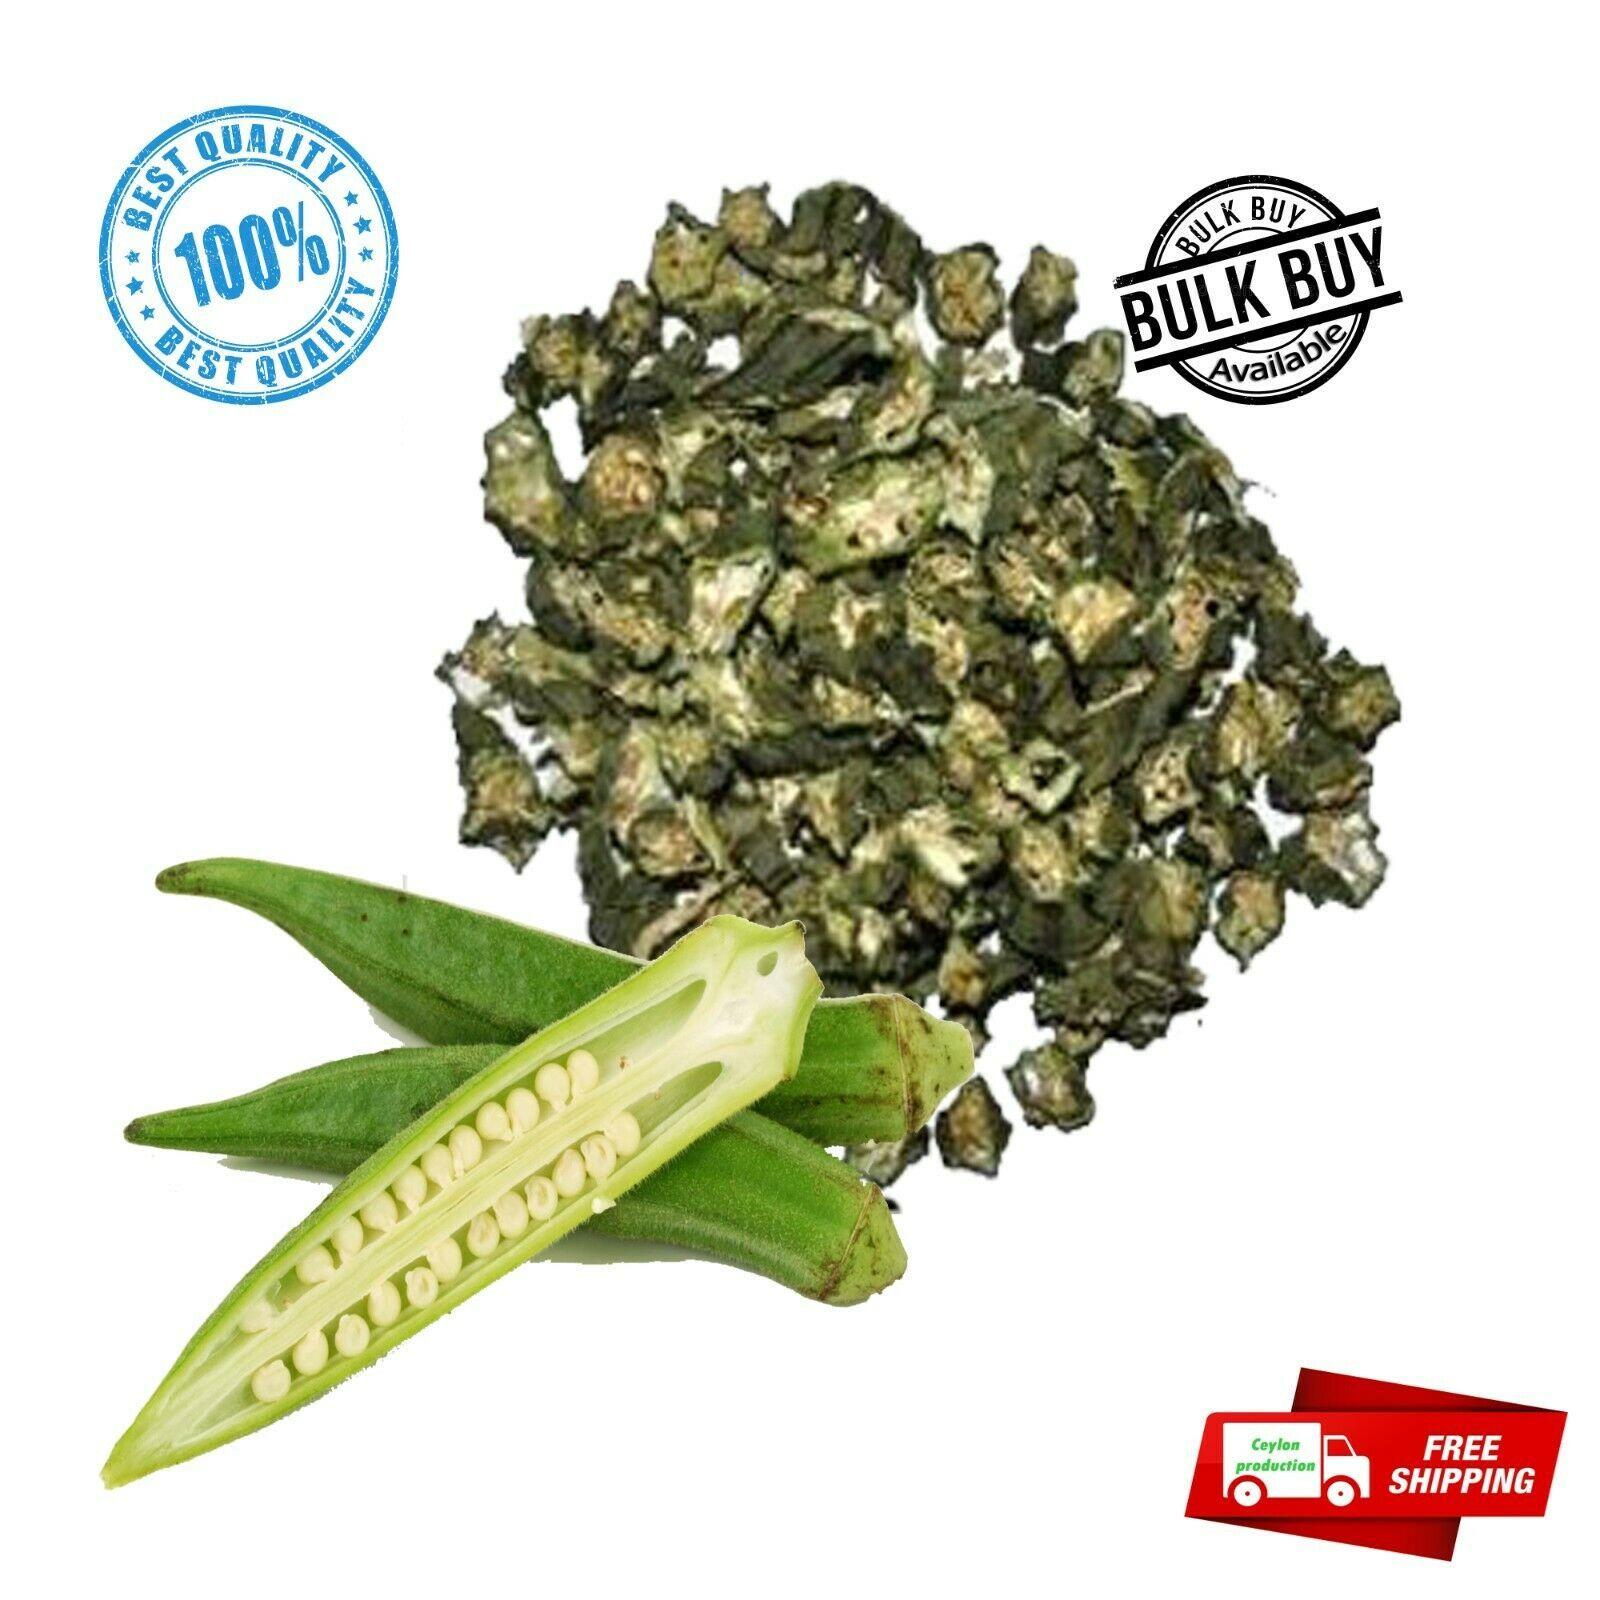 Okra/ladies'finger slices dried  for Soups premium quality organic Ceylon - $5.66 - $159.89